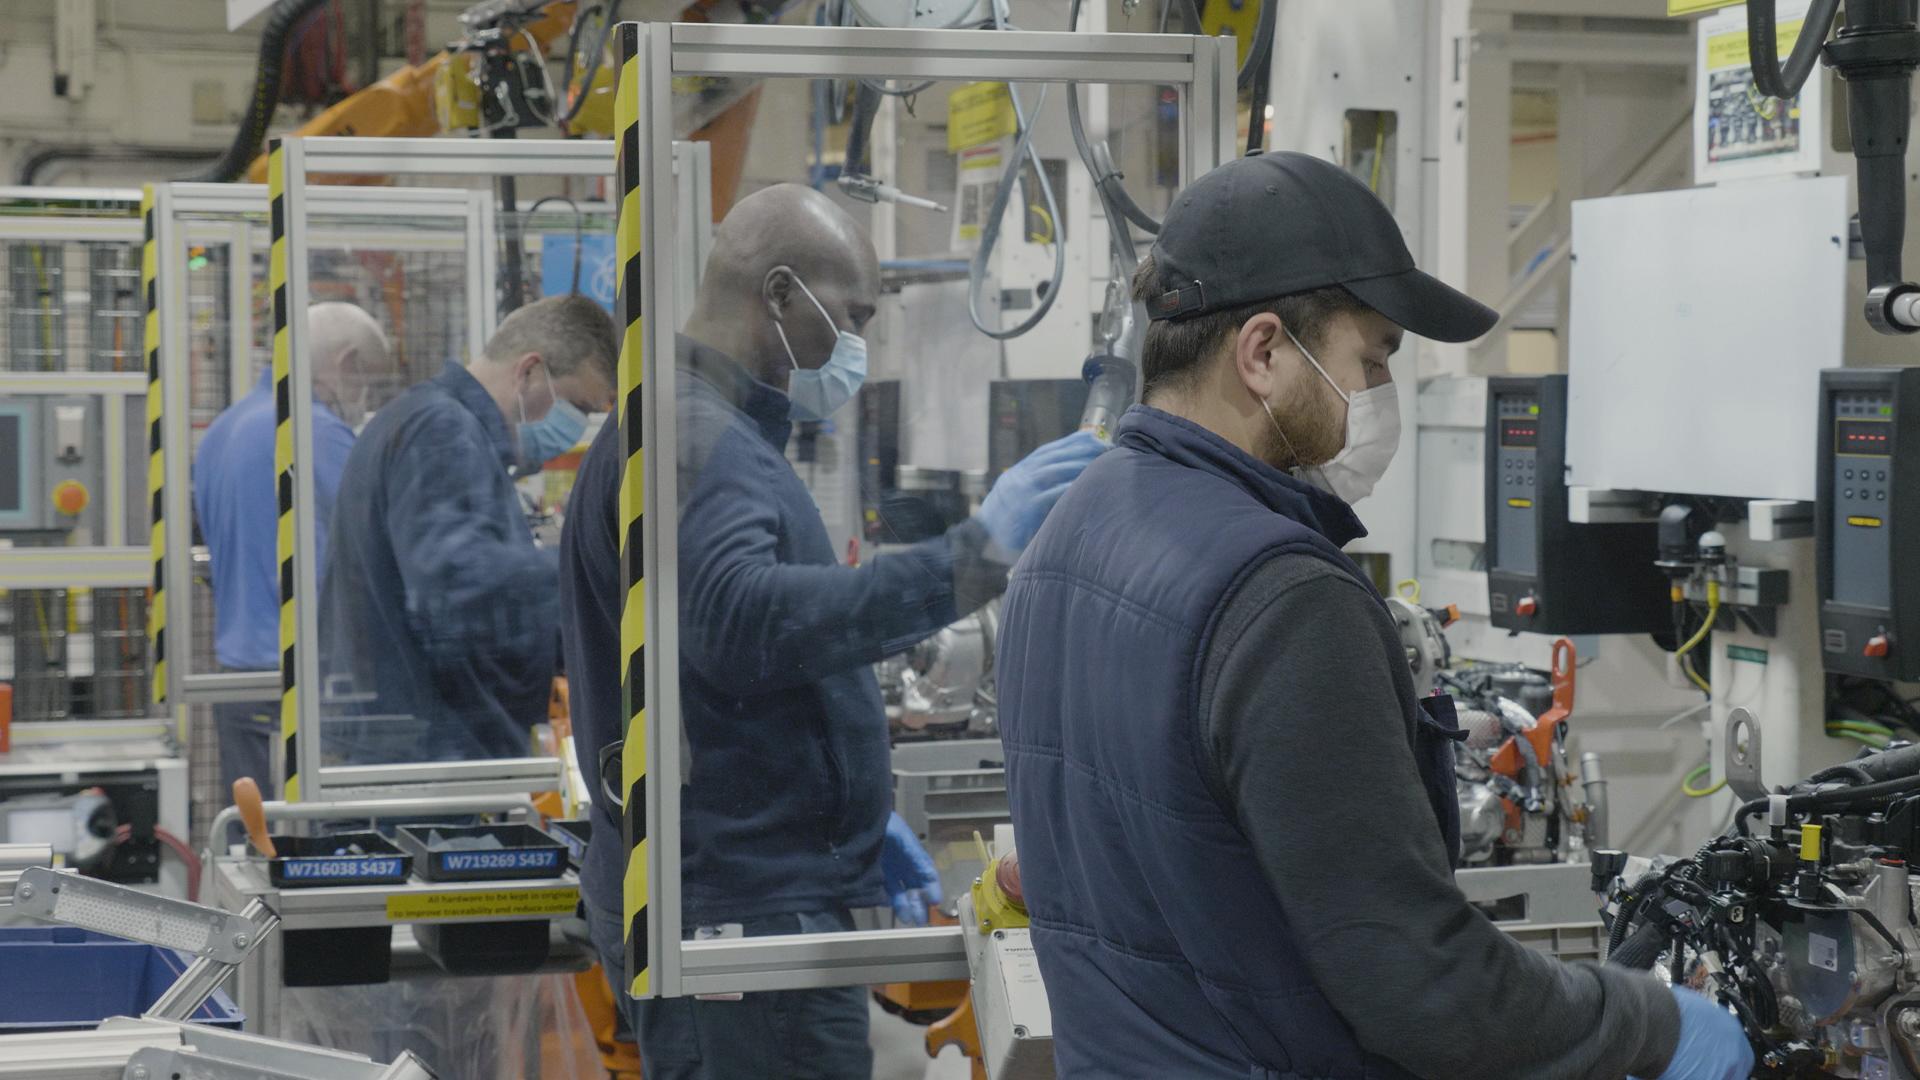 Ford Dagenham staff wearing masks